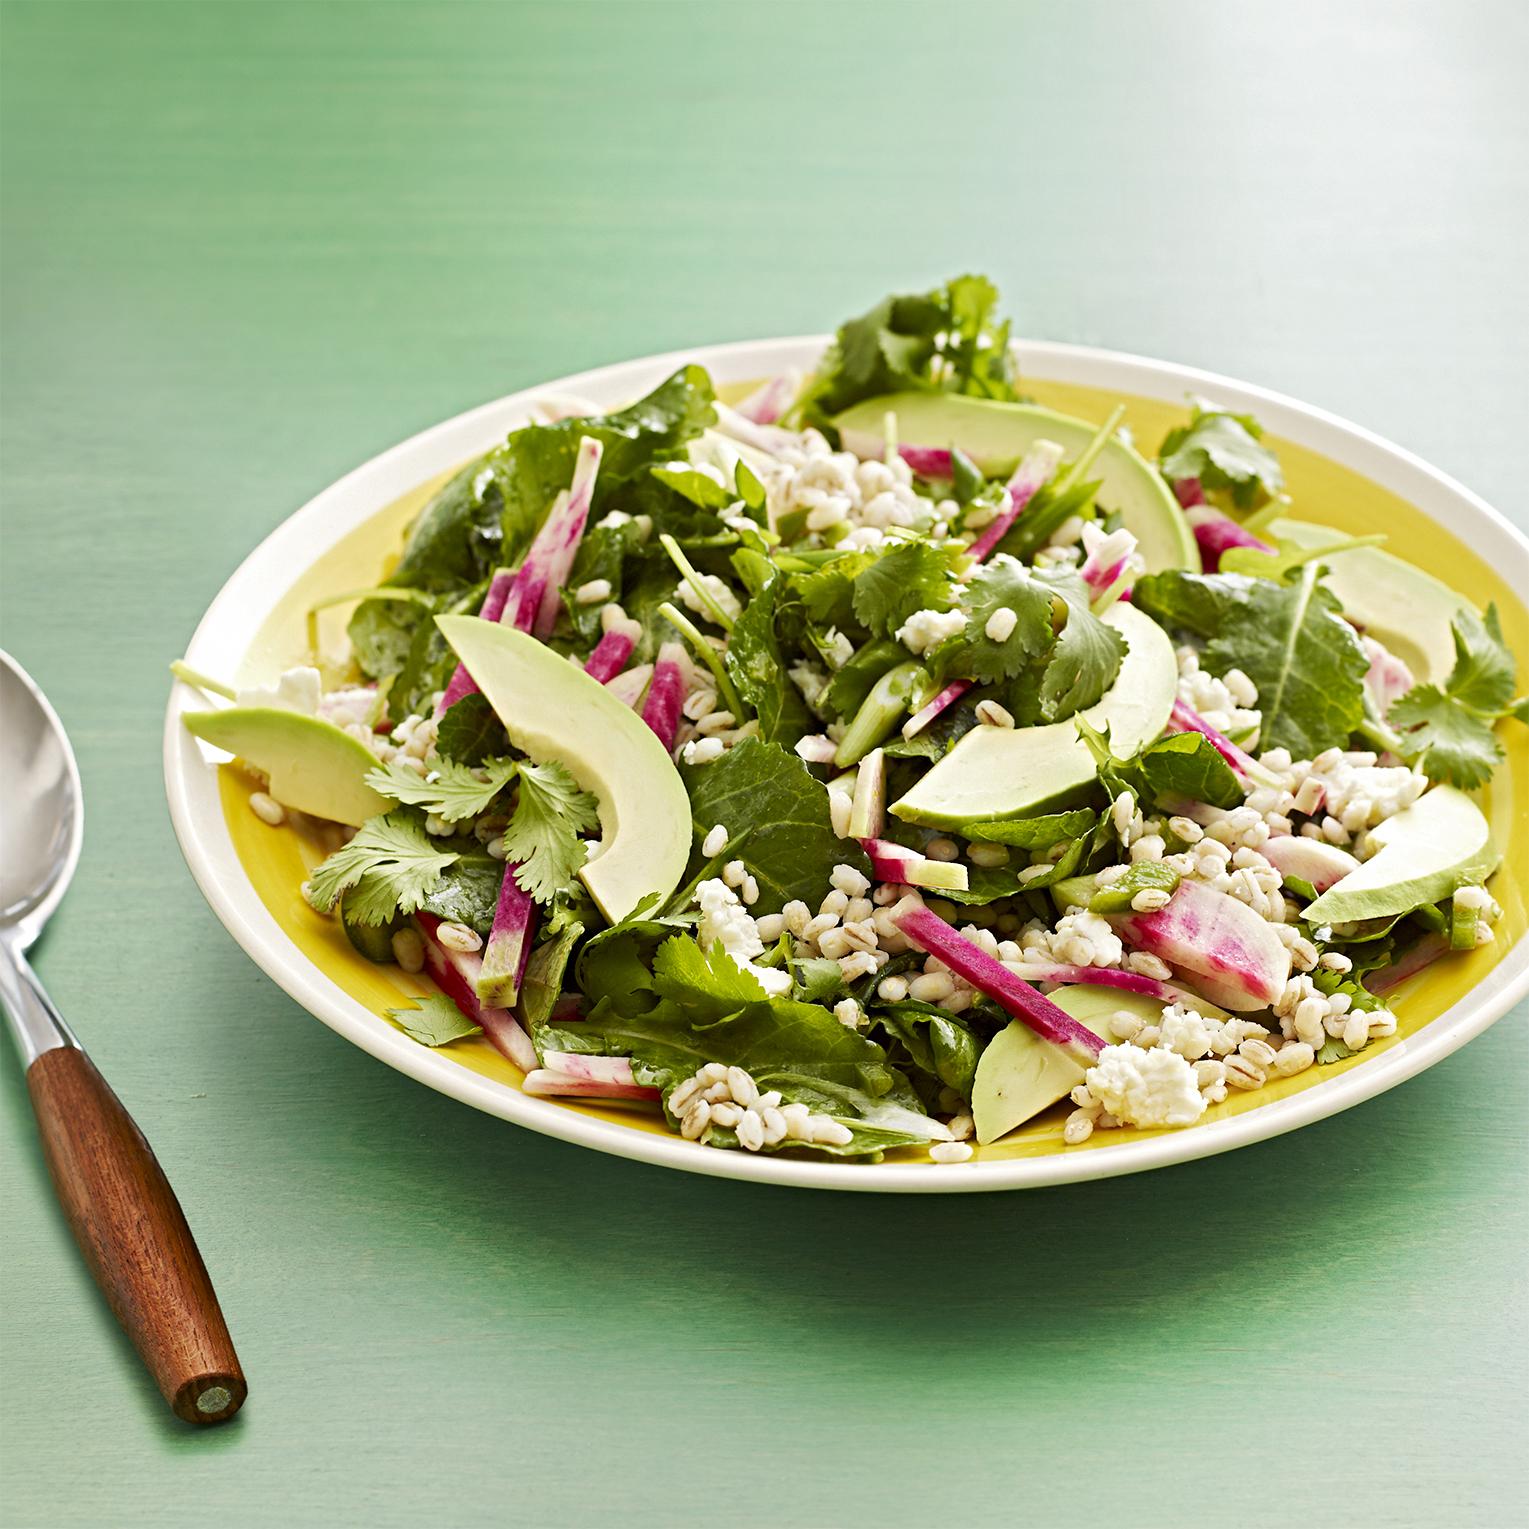 kale and barley salad